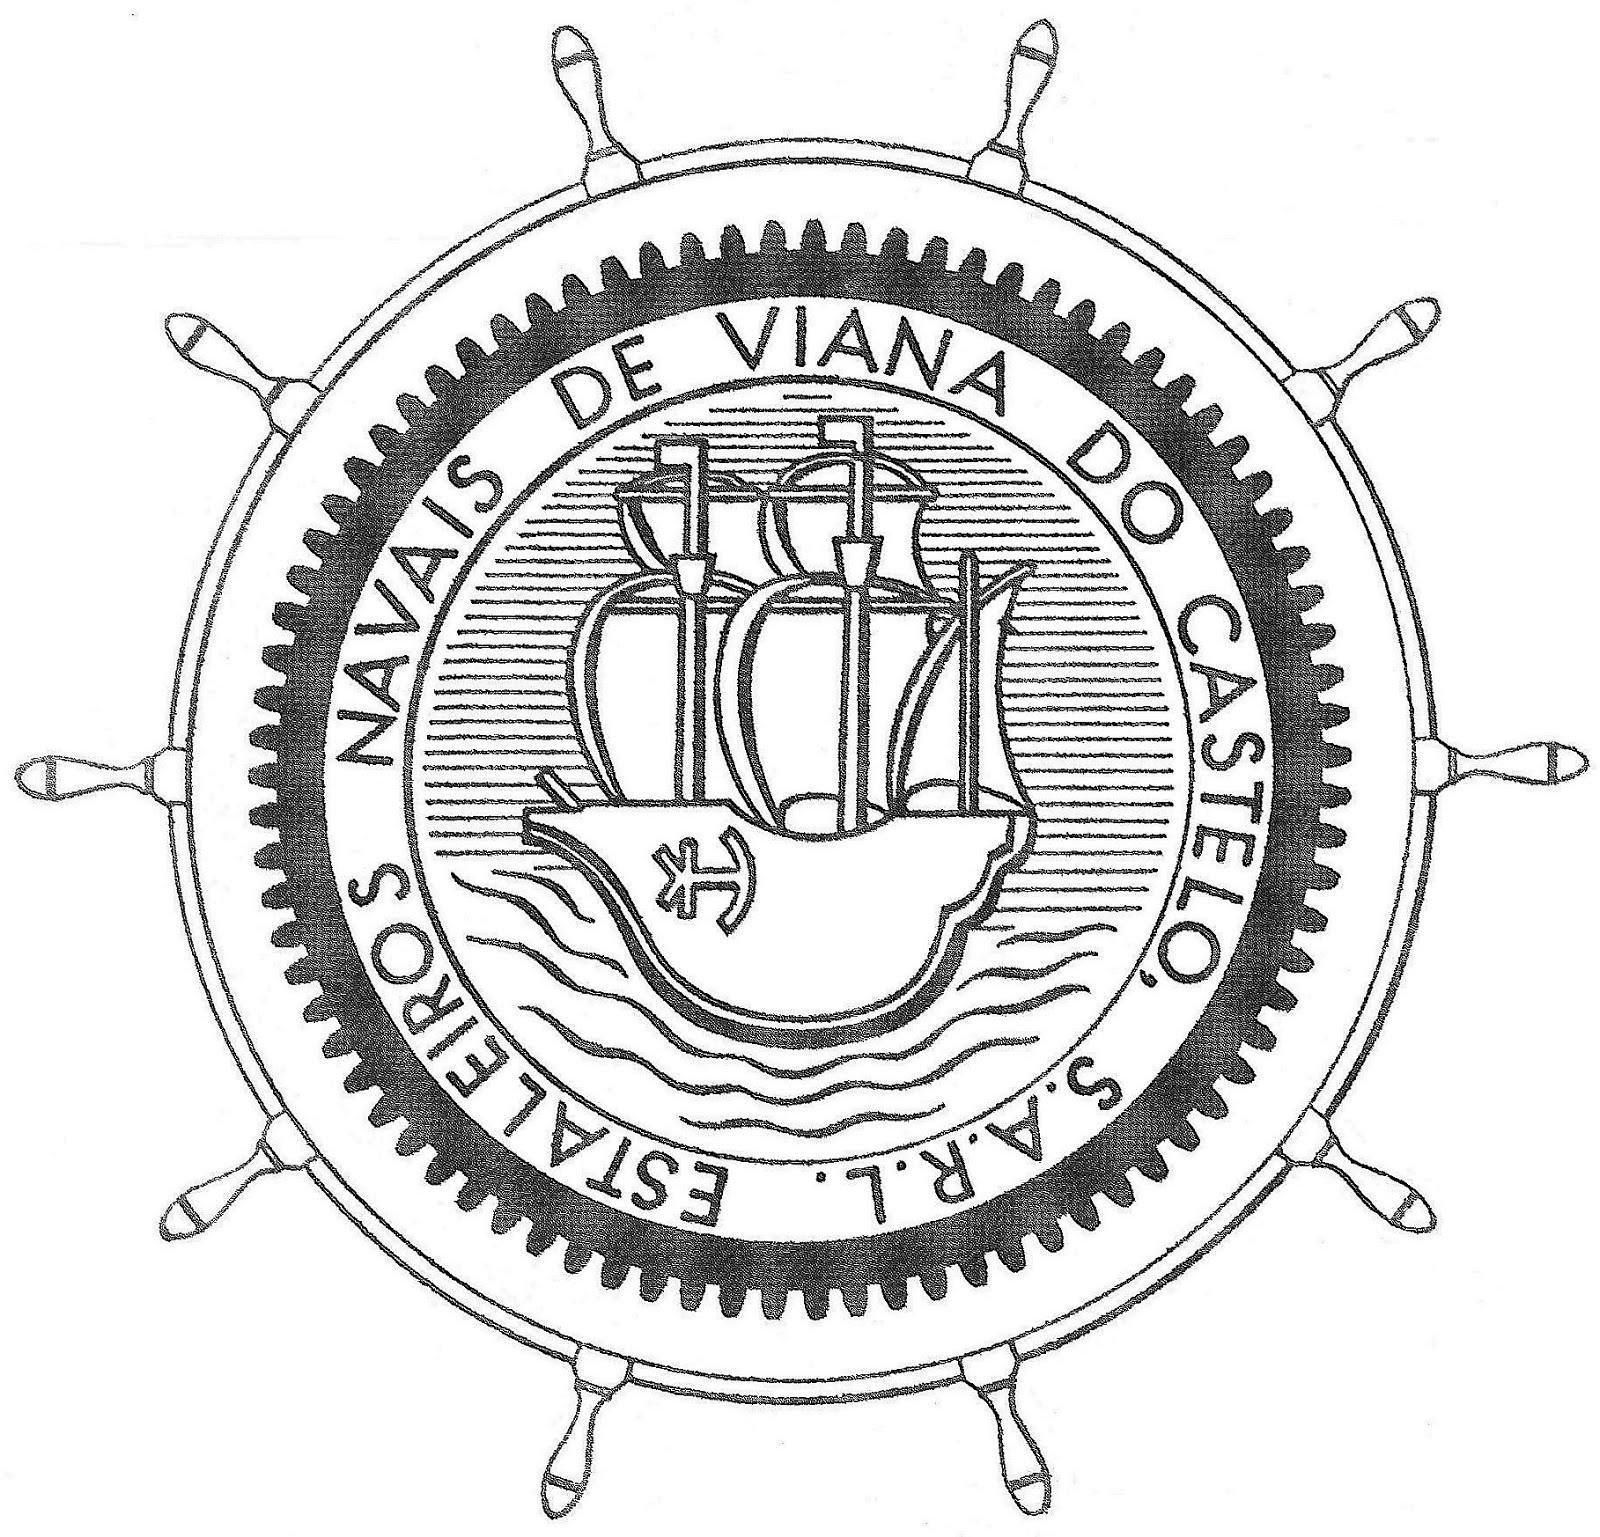 Simbolo dos Estaleiros Navais de Viana do Castelo